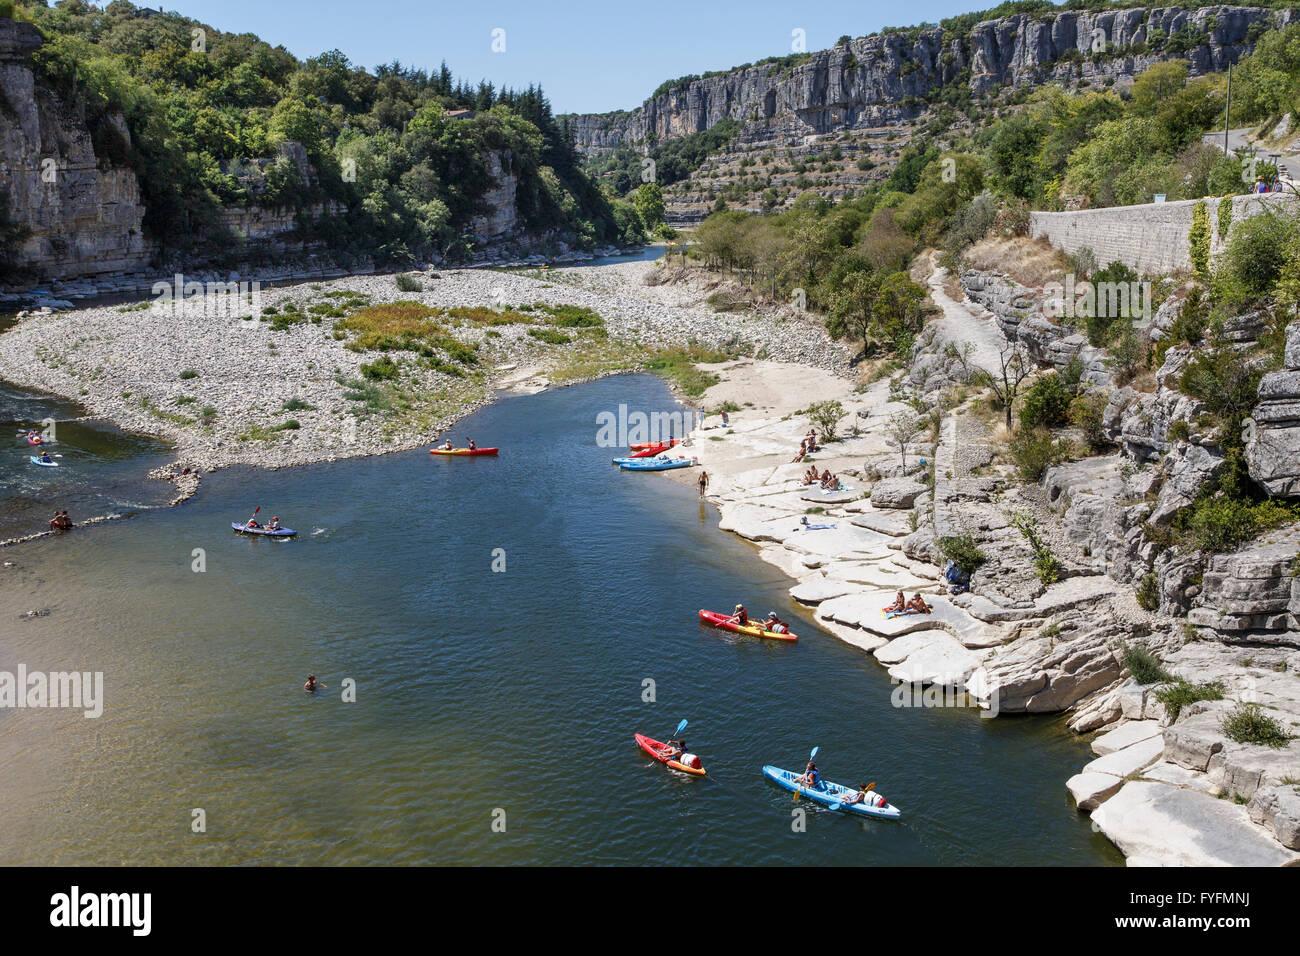 River Ardèche at Balazuc, Ardèche, France - Stock Image